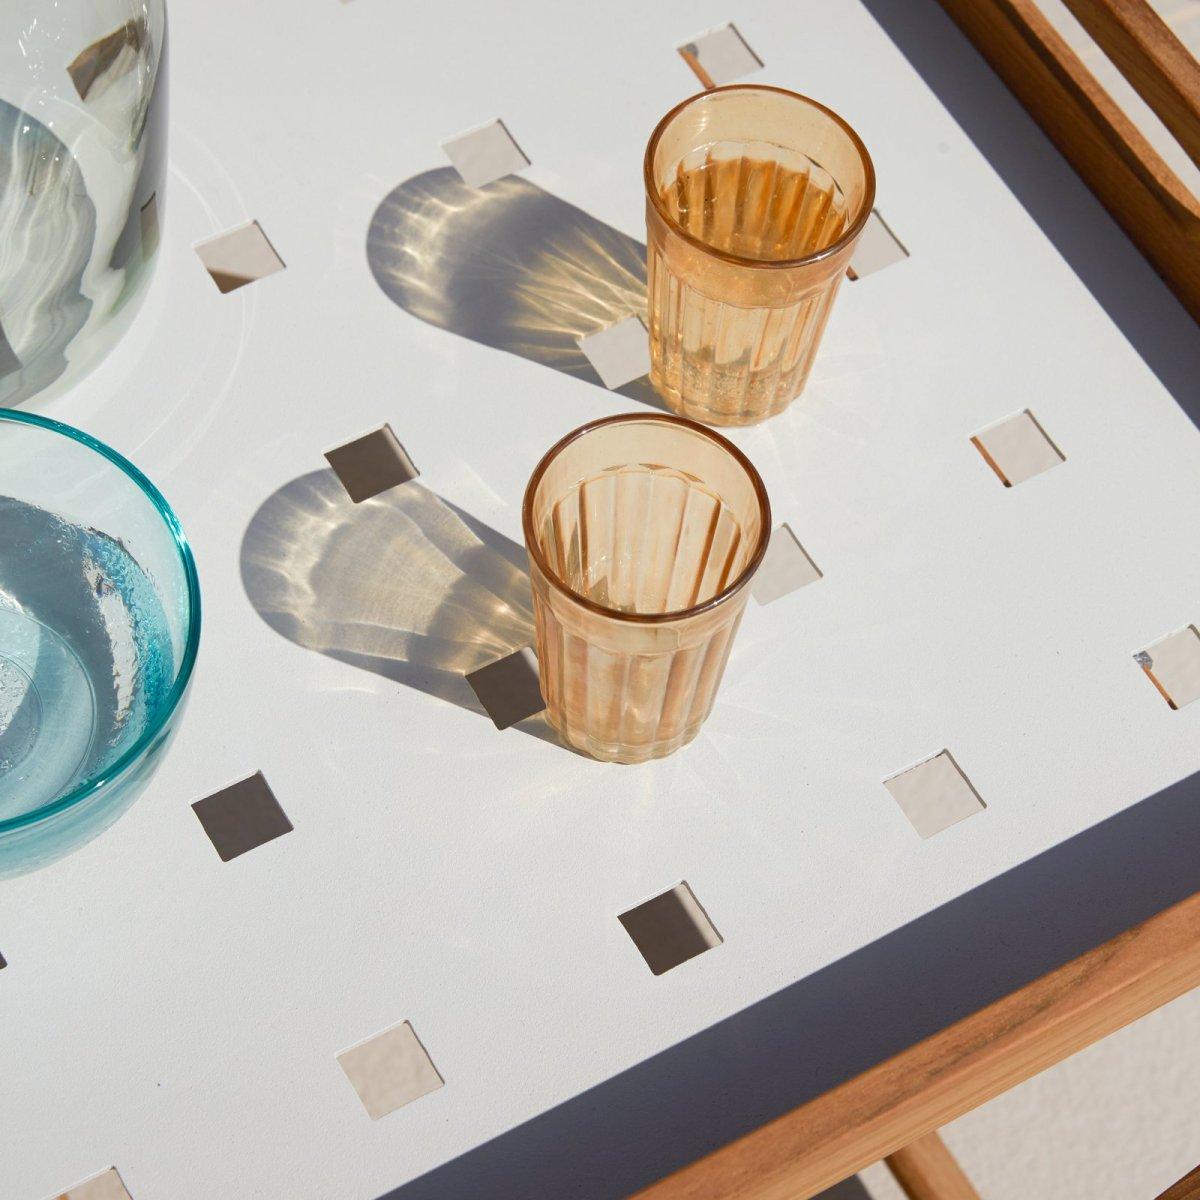 Amaze Folding Side Table, detail.